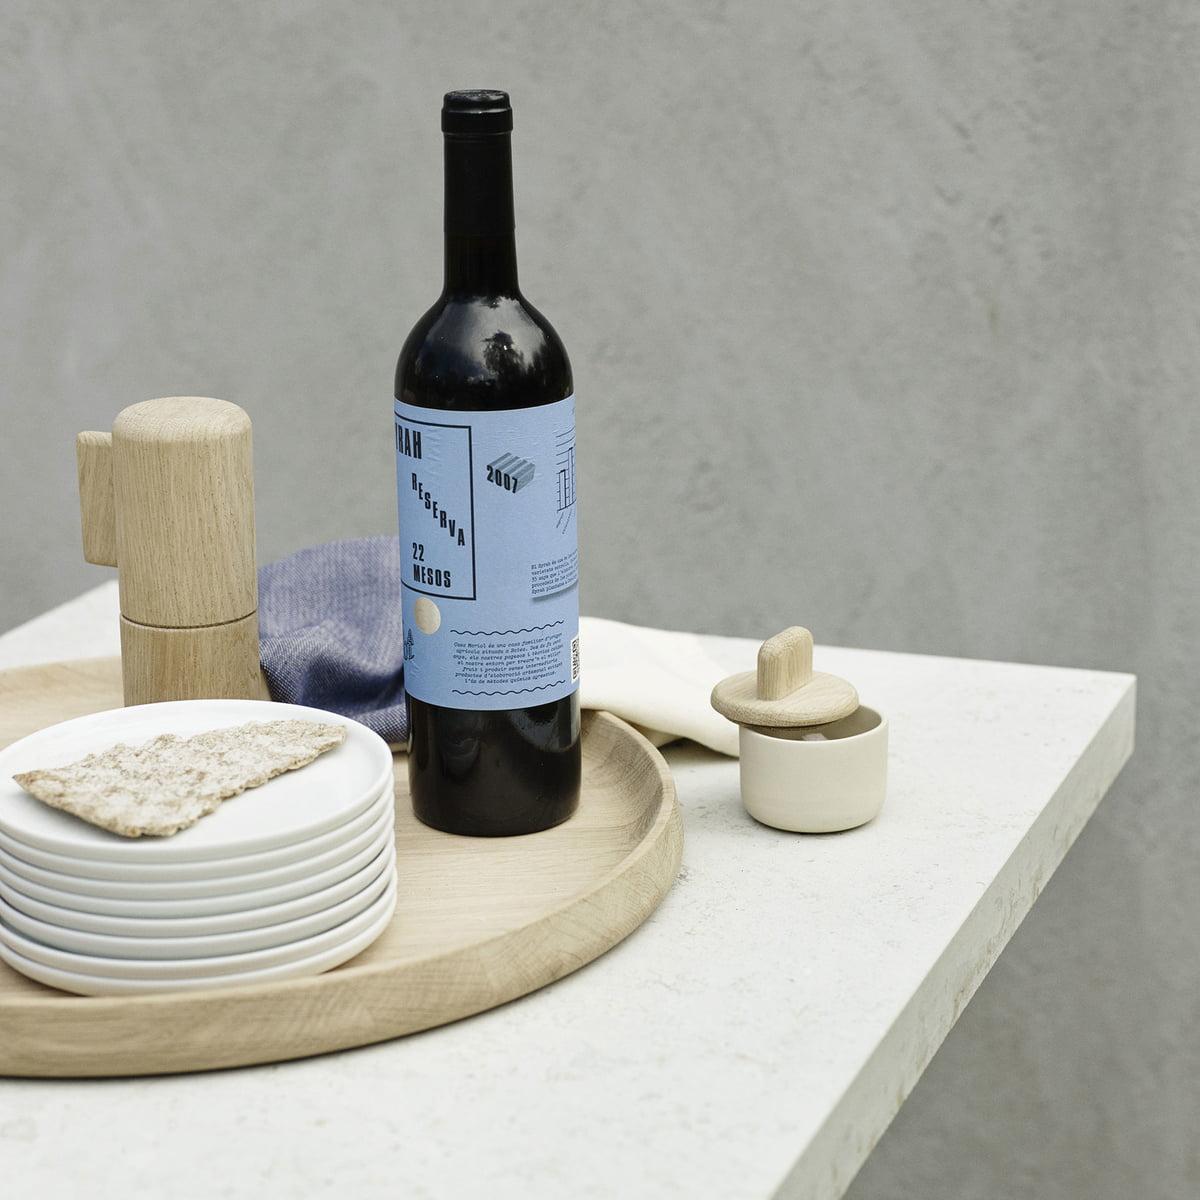 moulin pices paddle de skagerak. Black Bedroom Furniture Sets. Home Design Ideas